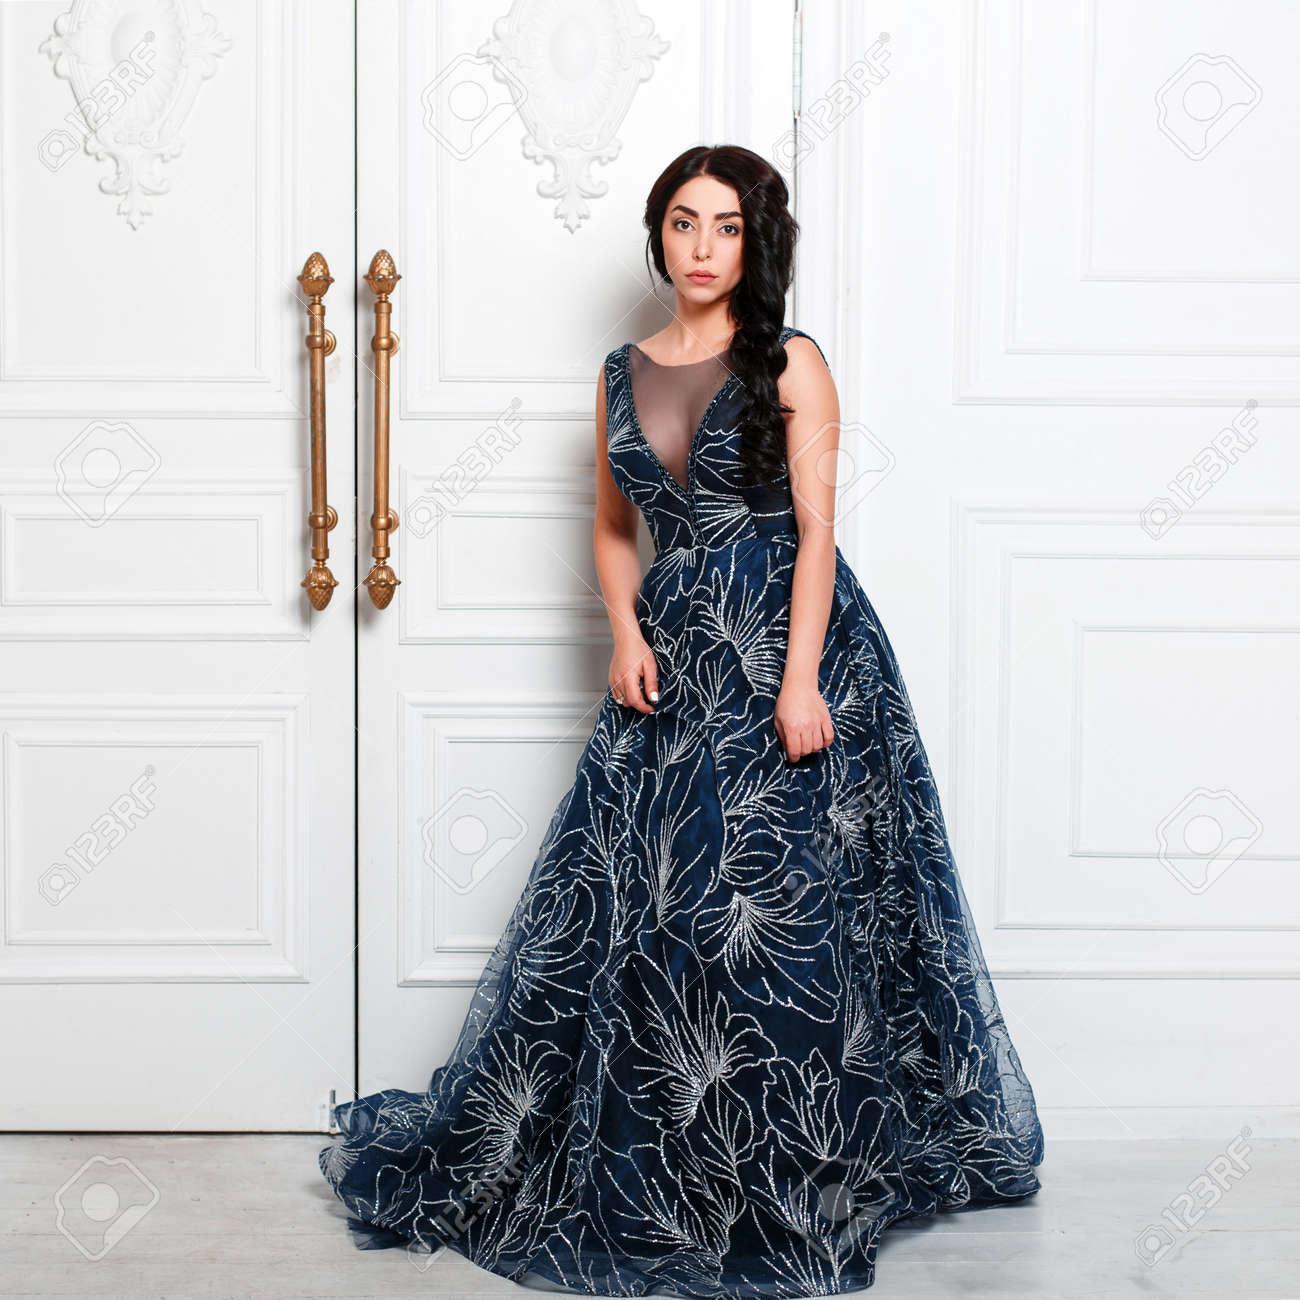 Beautiful young girl in a stylish elegant